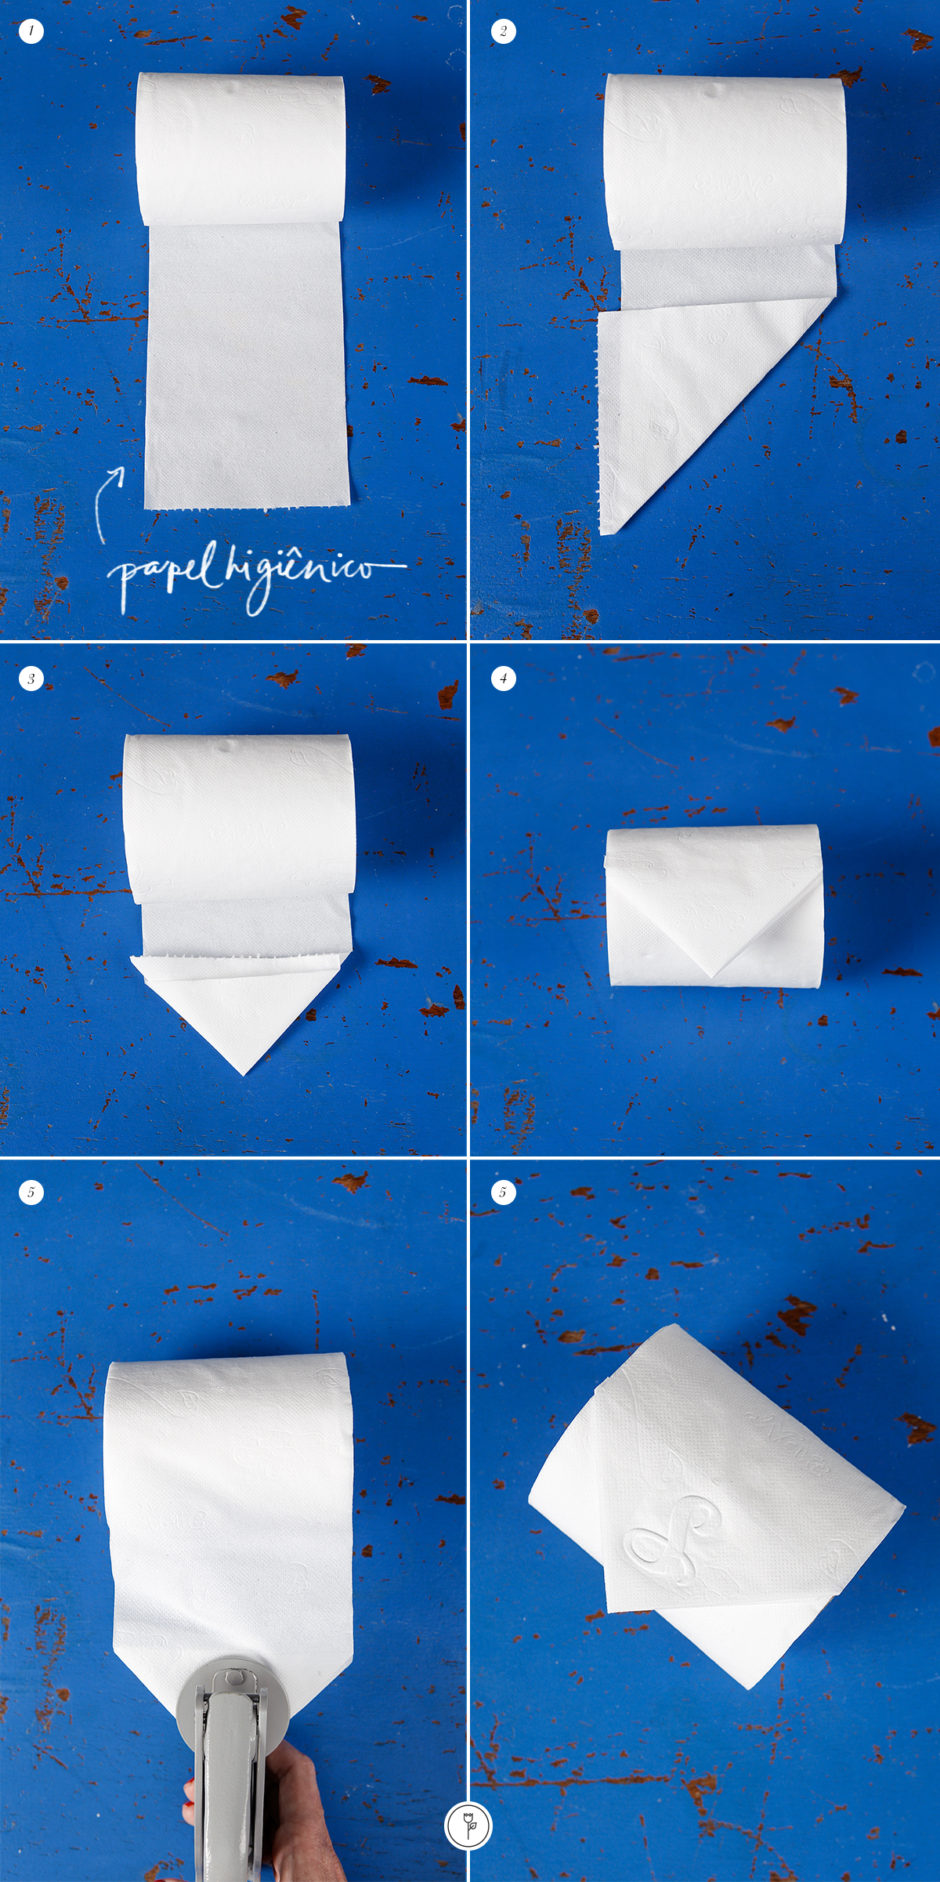 chancela papel higienico